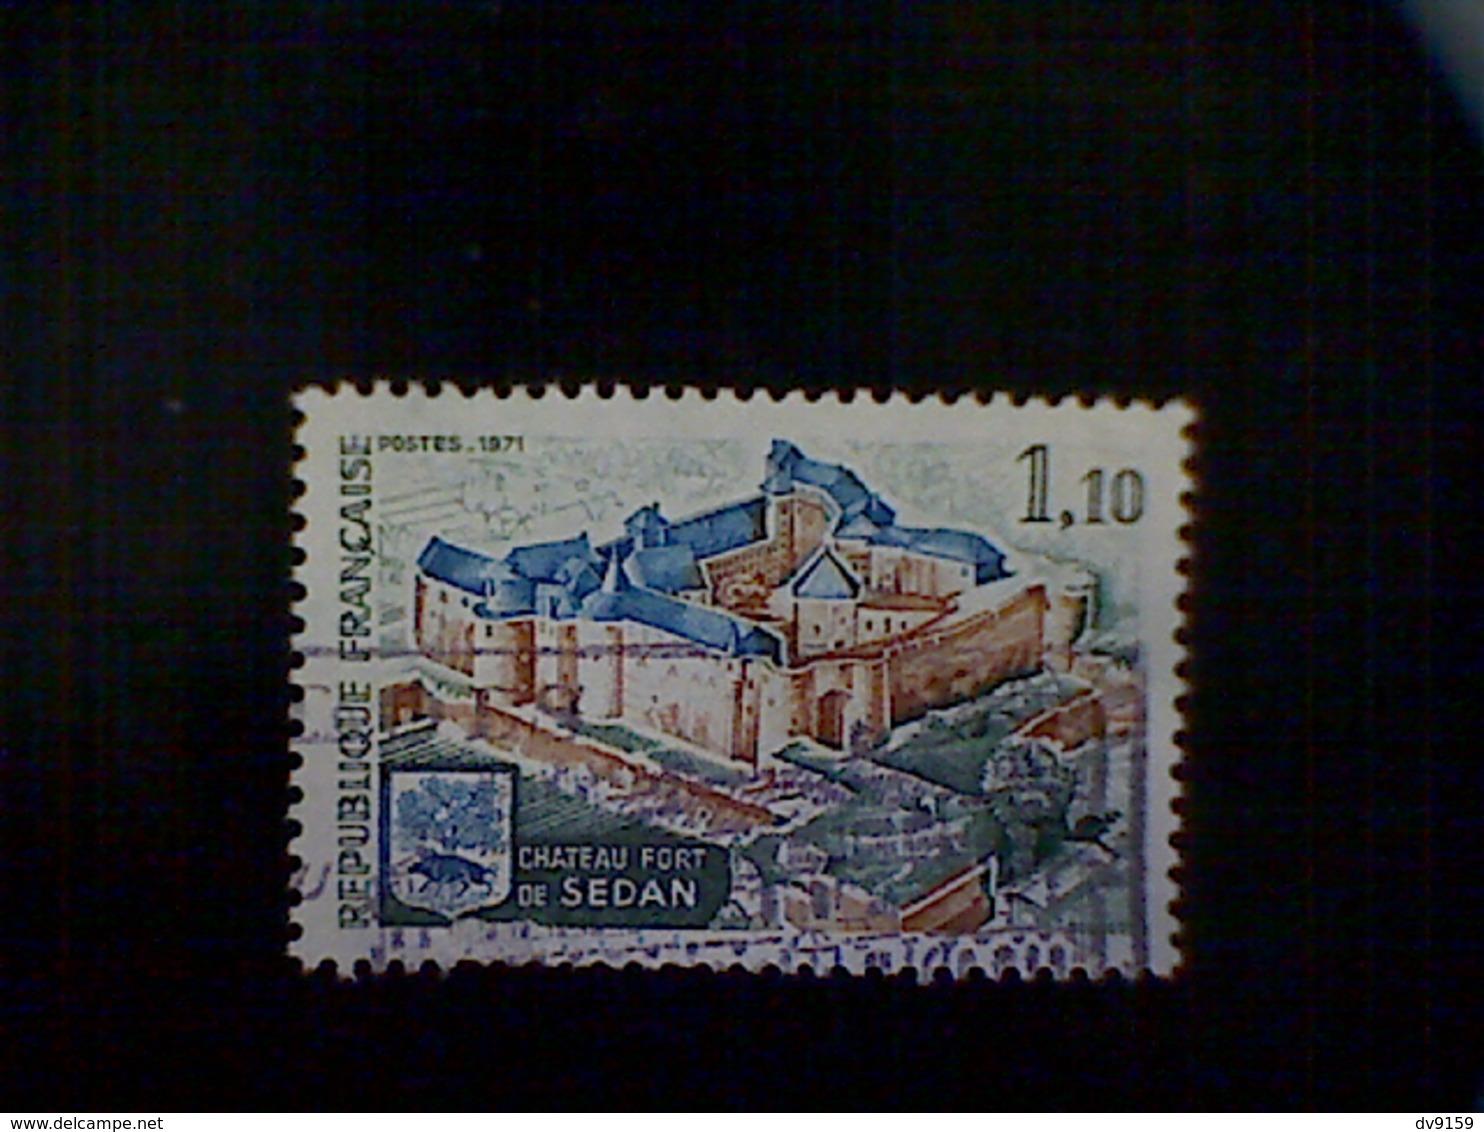 France, Scott #1313, Used(o), 1971, Chateau De Sedan, 1.10frs, Slate Green, Prussian Blue, And Brown - France